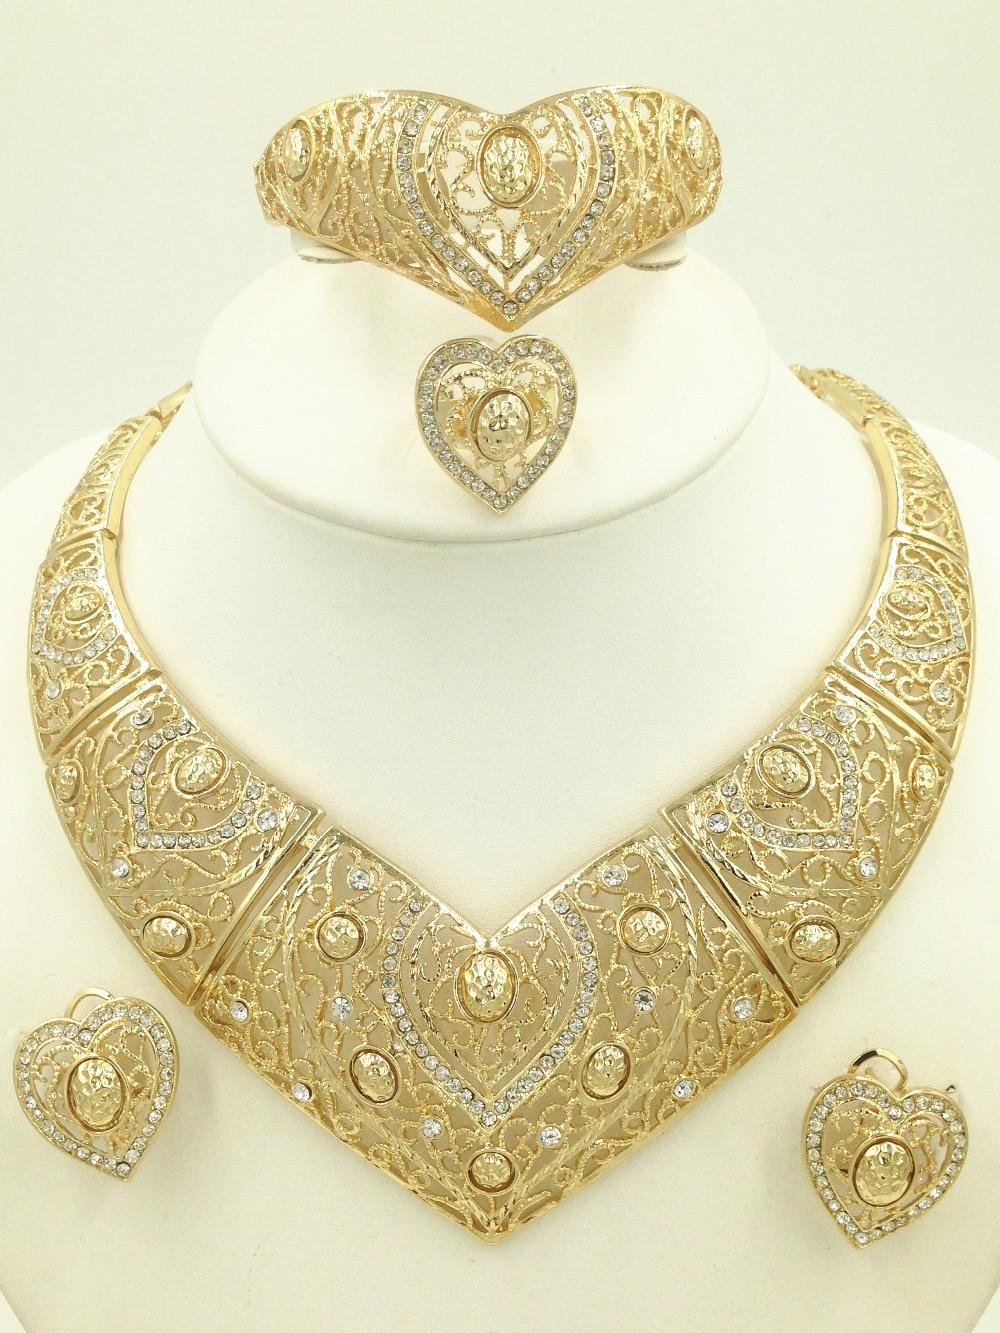 New 2016 Fashion Dubai Gold Plated Jewelry Set 18K Luxury Nigerian